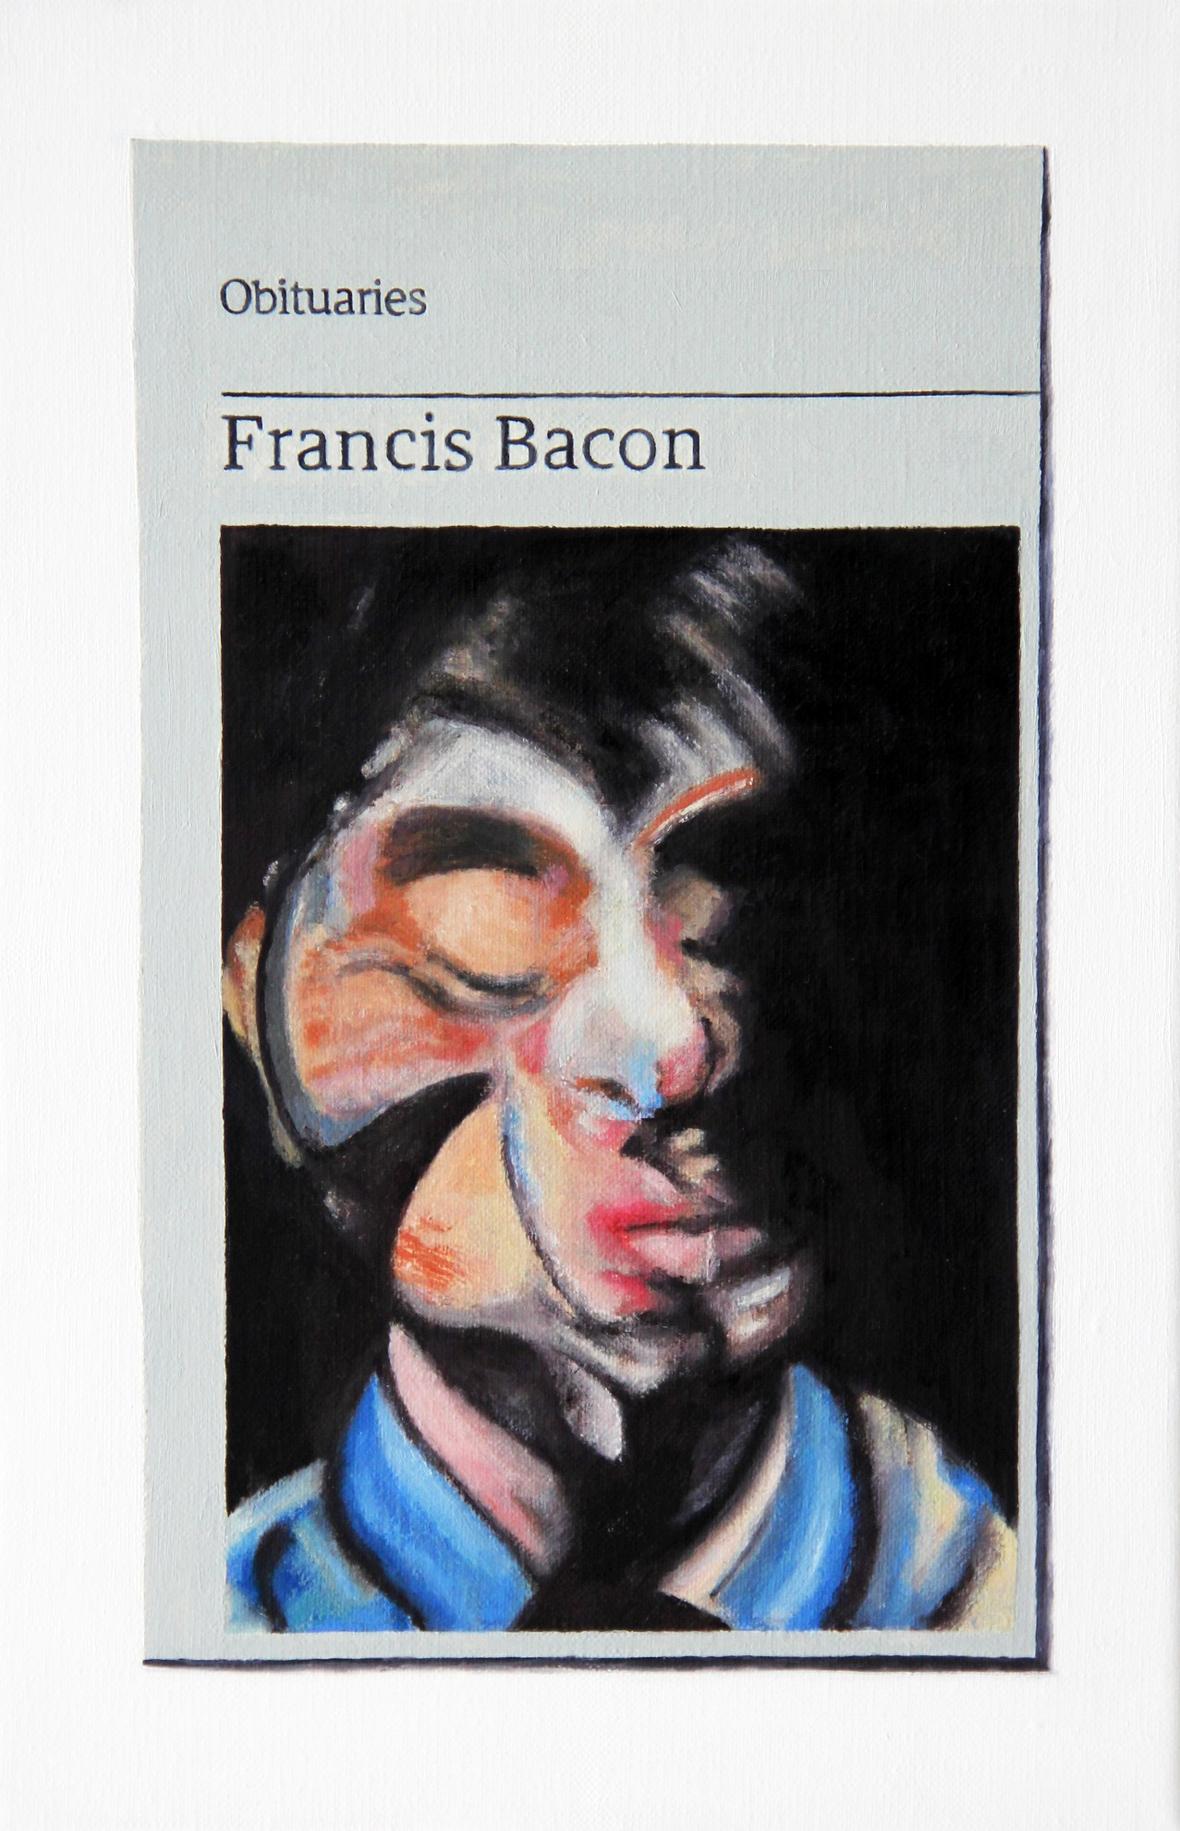 Mendes Hugh Obituary Francis Bacon 2017 Oil on linen 30x20cm